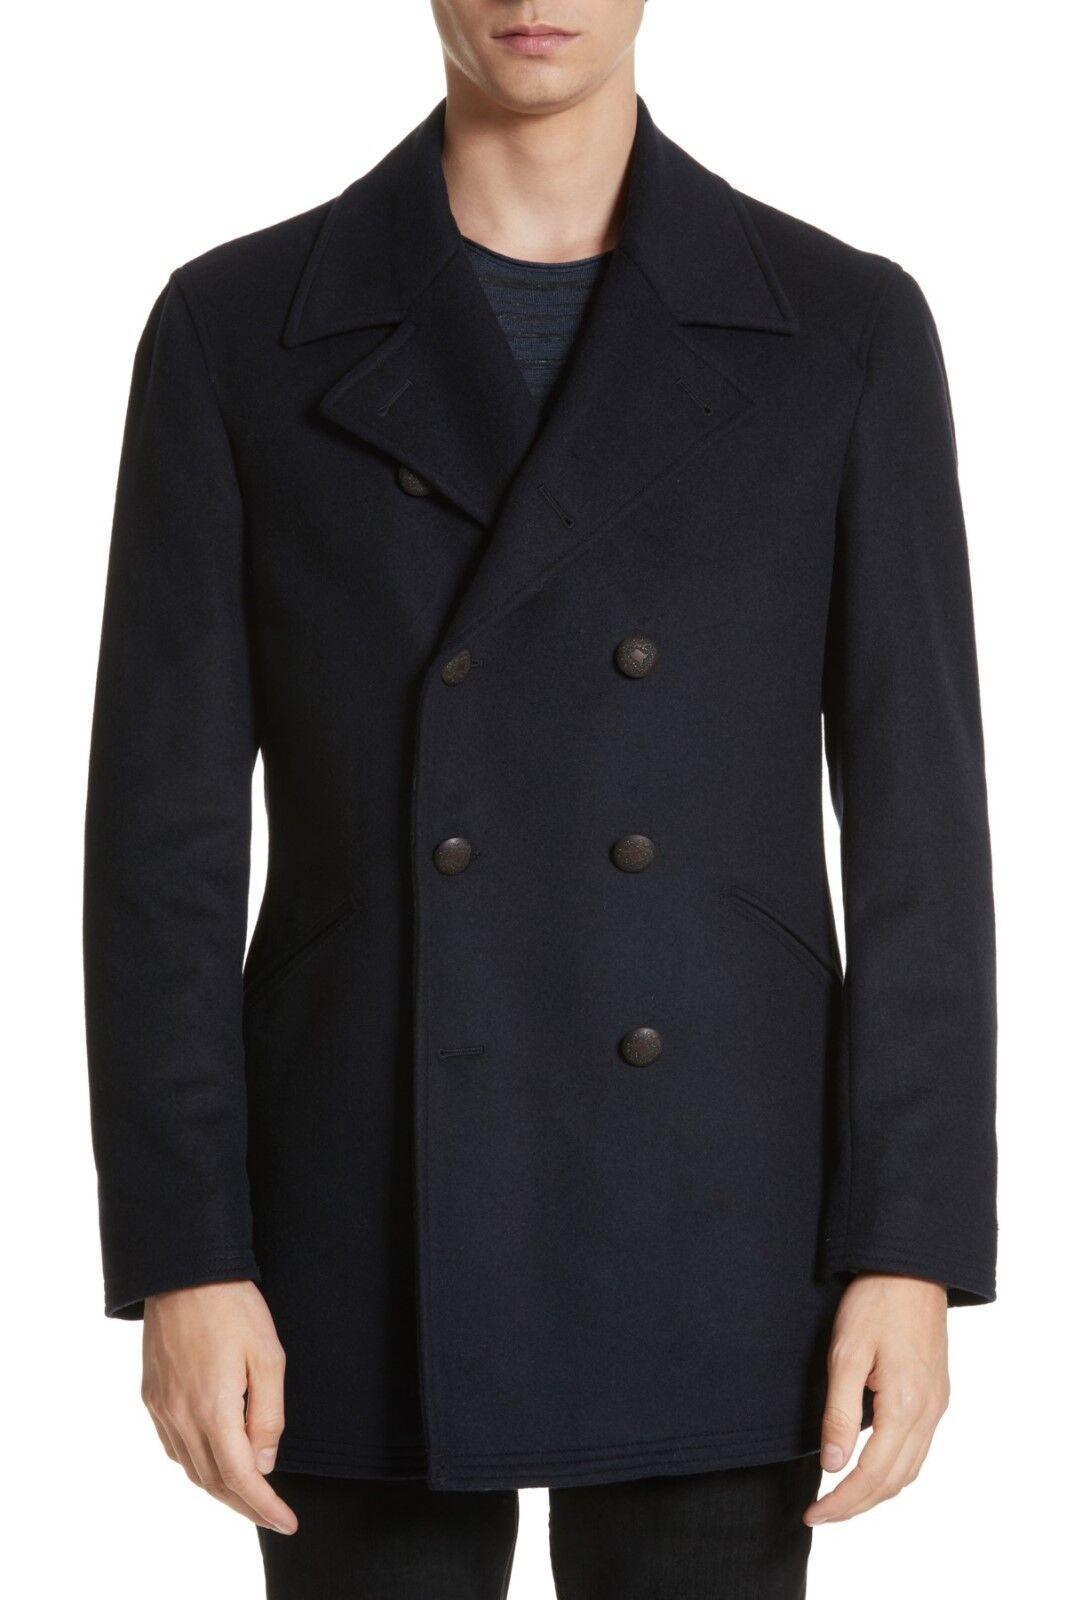 495 NEW John Varvatos Double-Breasted Wool blend Topcoat in Navy Größe 40REG